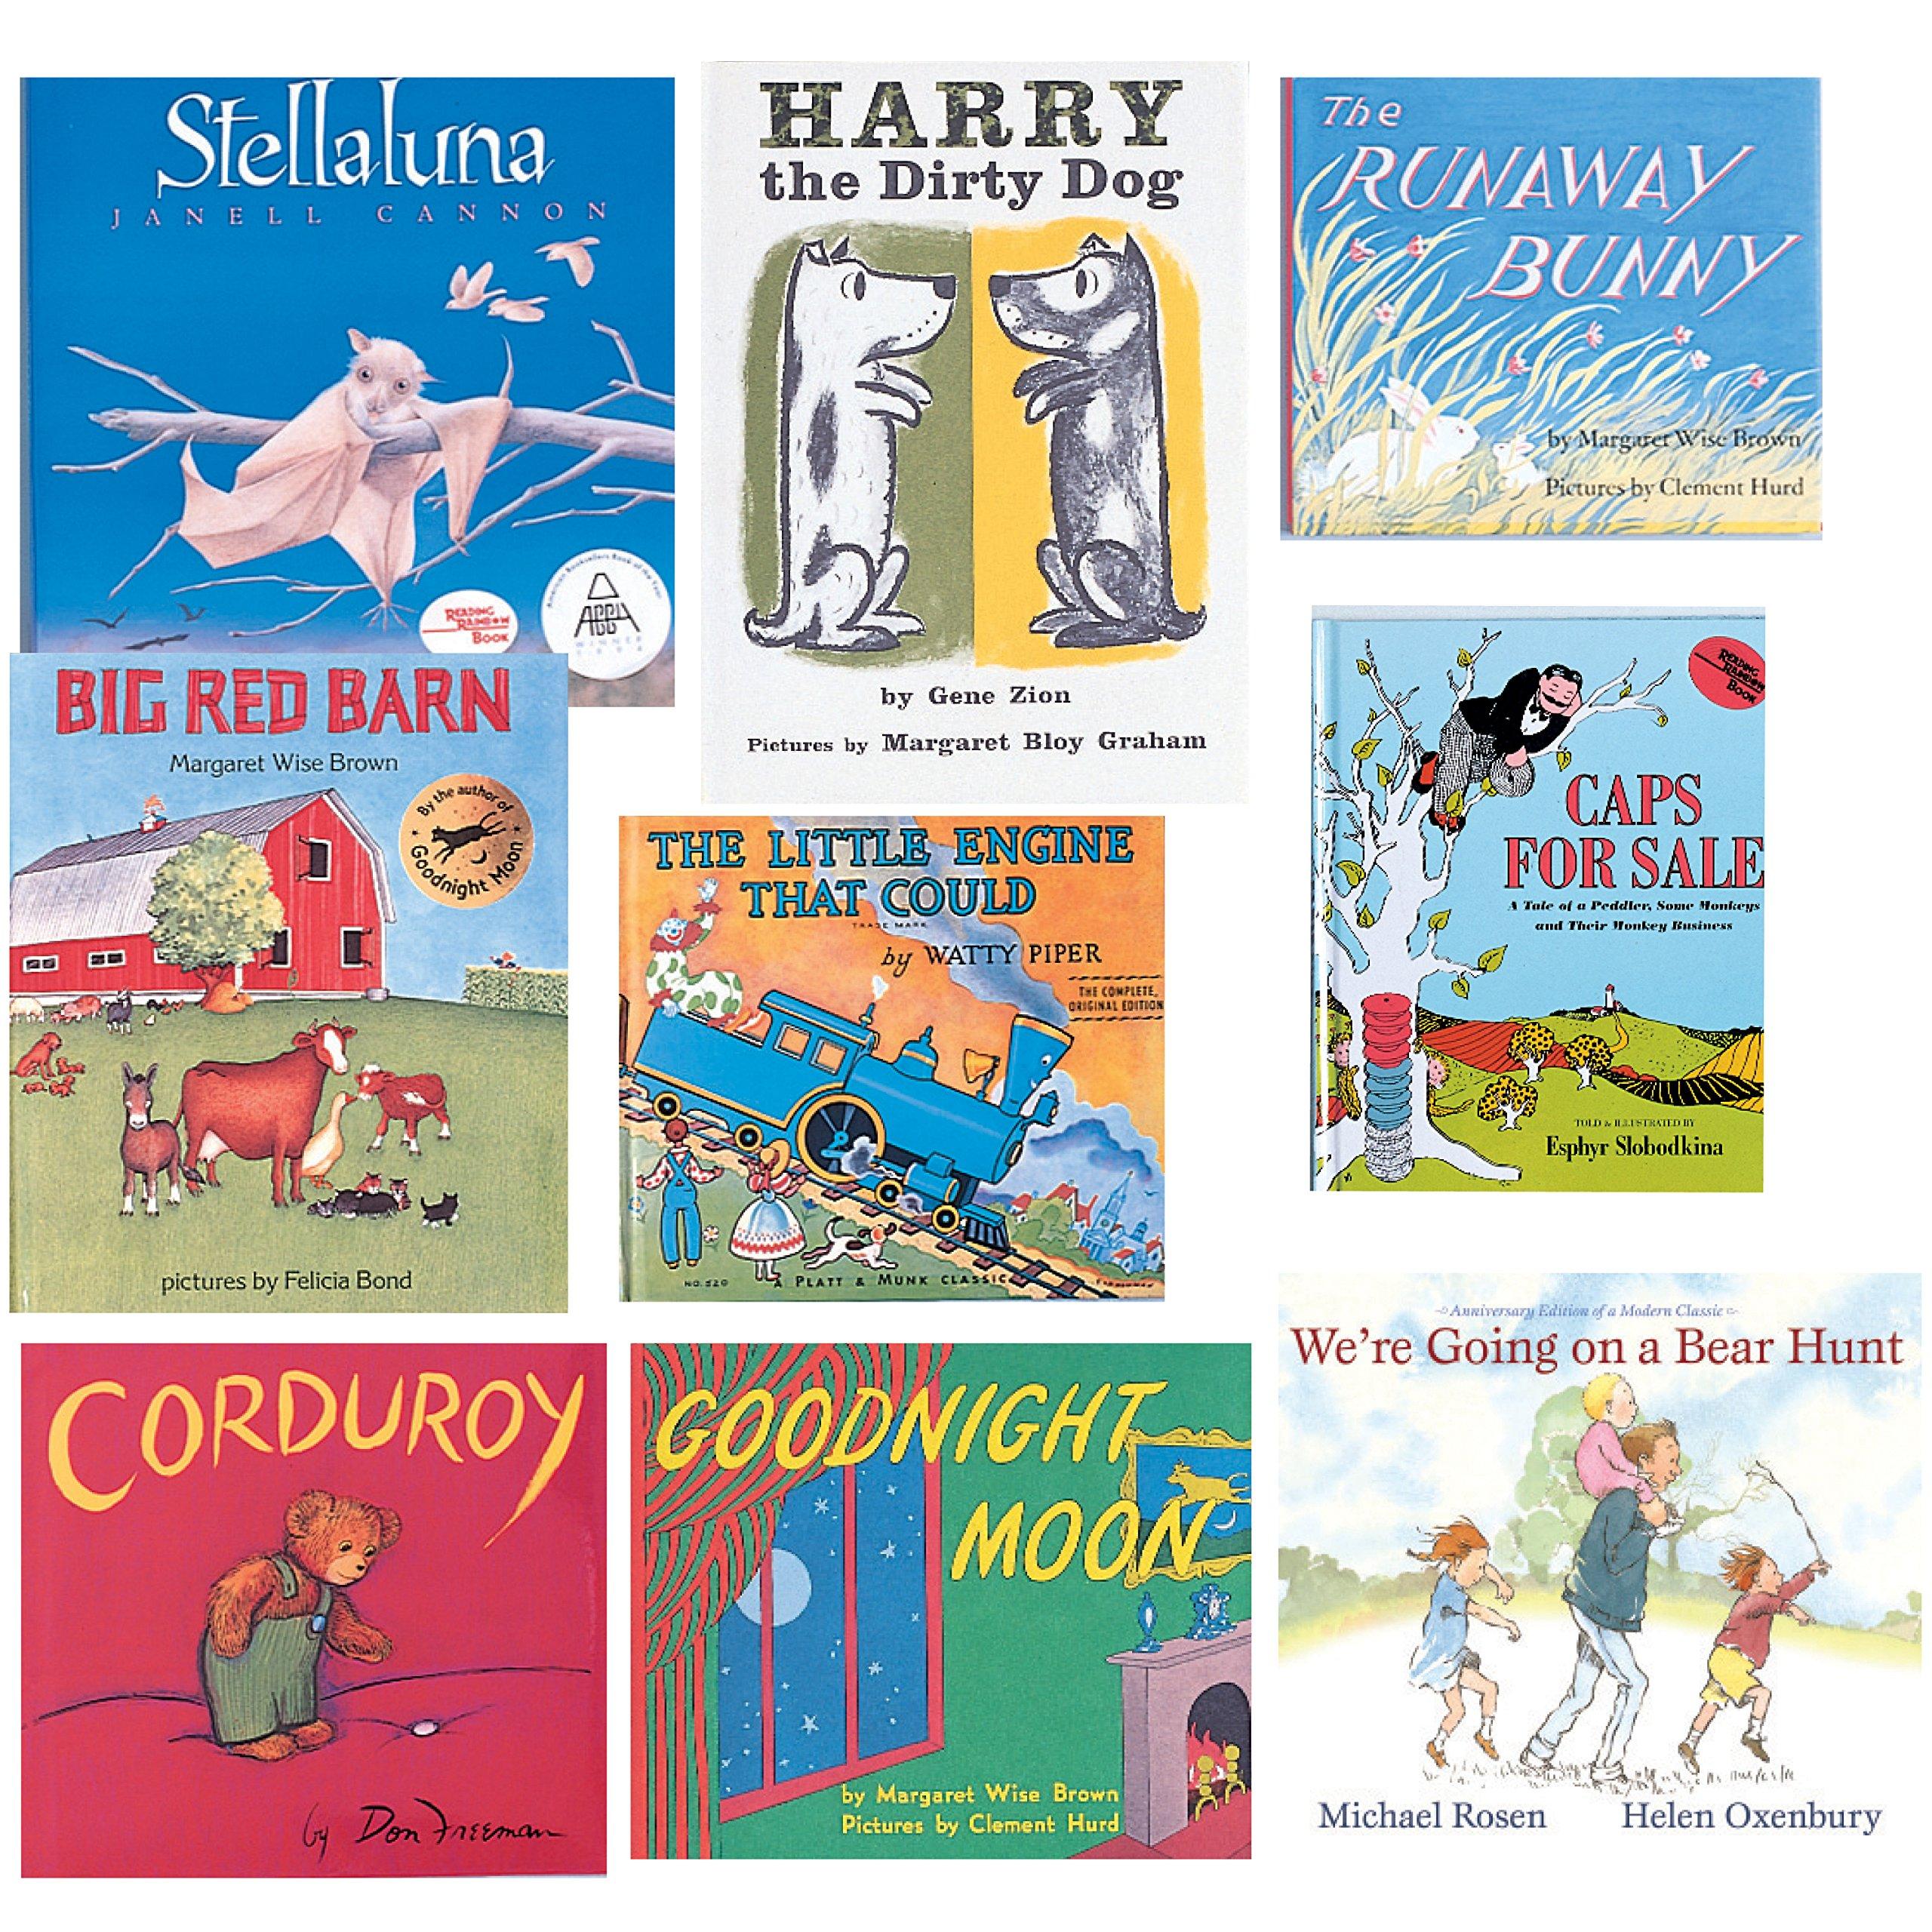 Constructive Playthings BOK-100 Children's Classic Library Hardcover Books, Grade: Kindergarten to 1, Set of 9